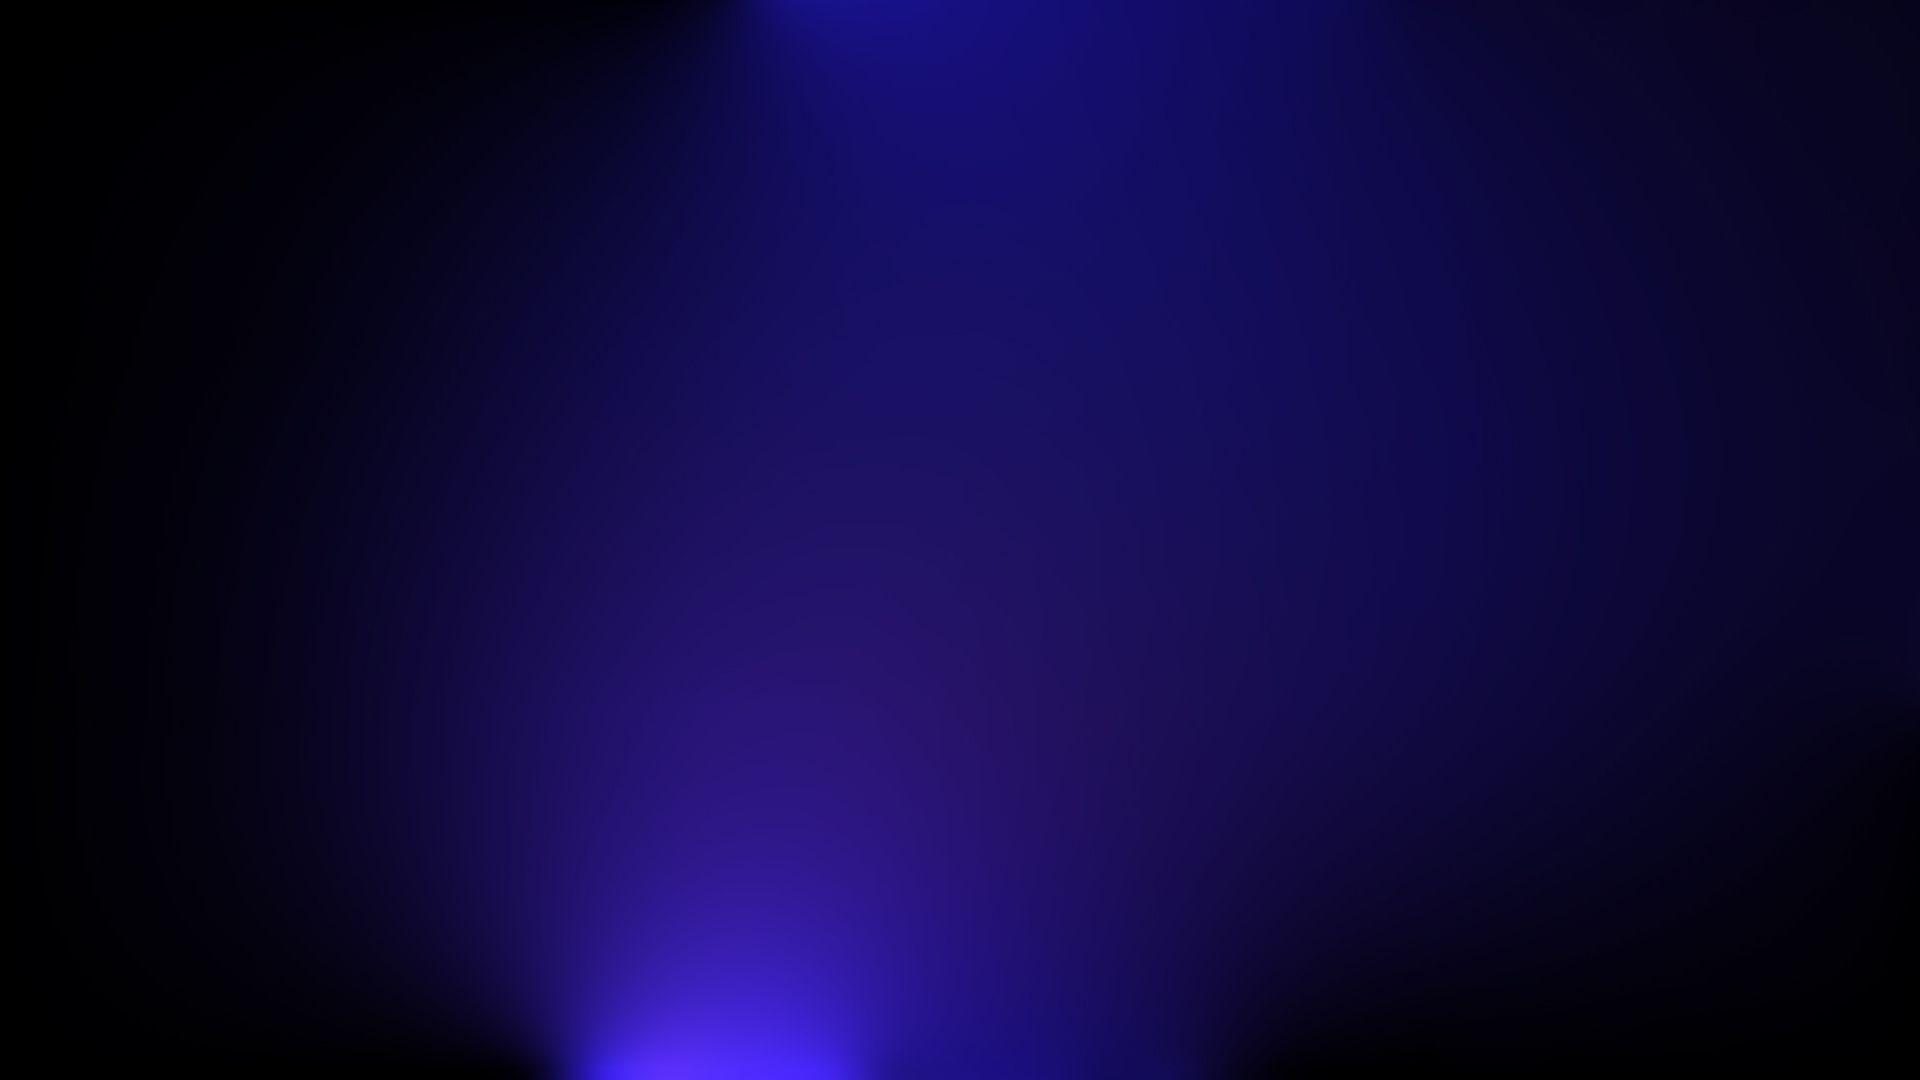 Dark Blue Backgrounds 1920x1080